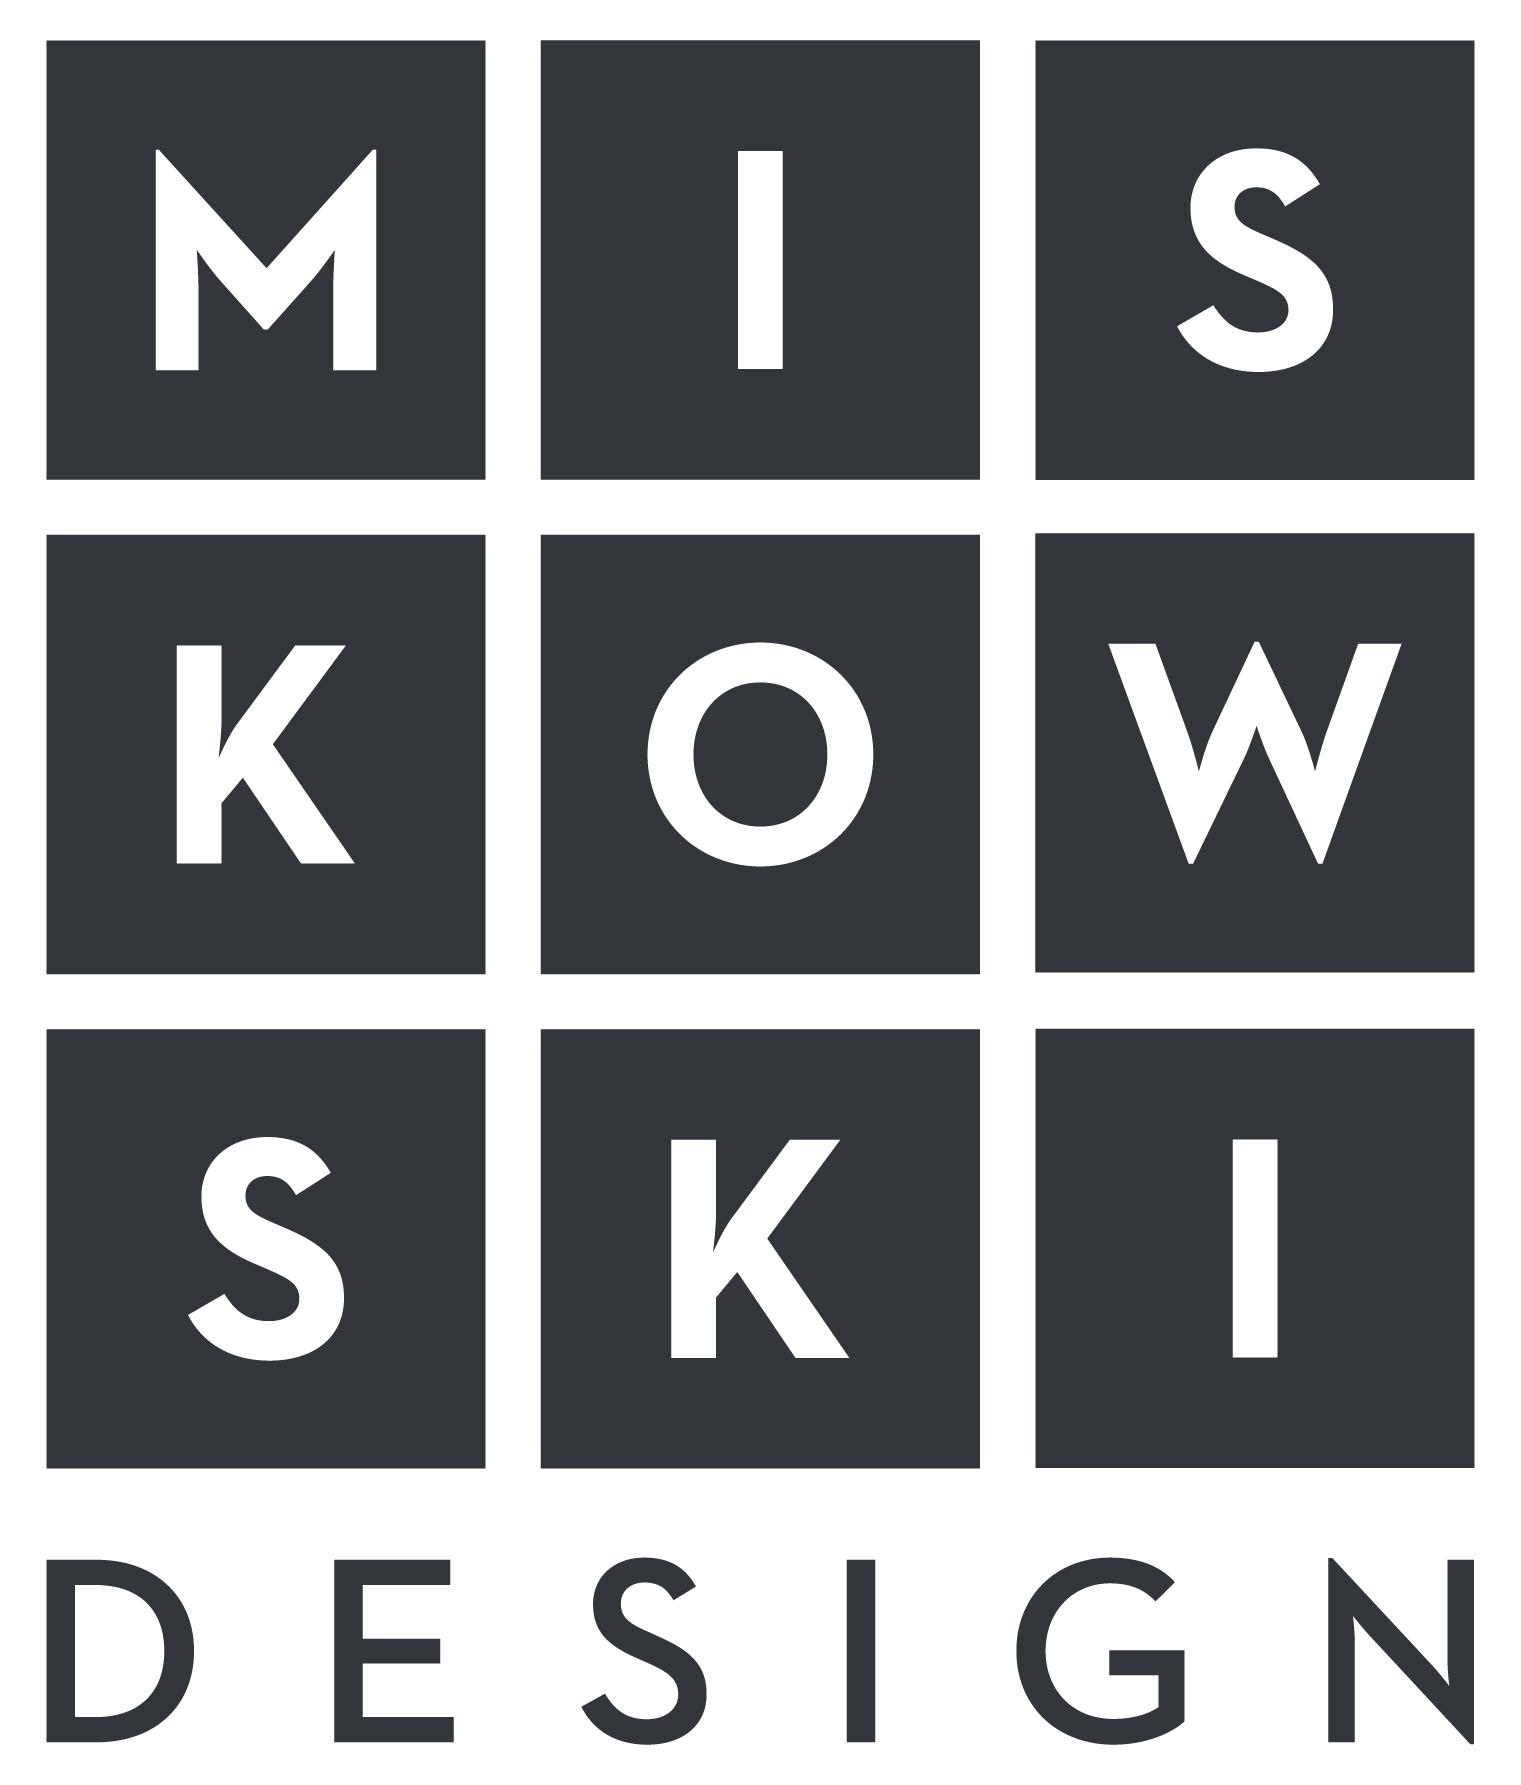 Miskowski Design on LogoLounge